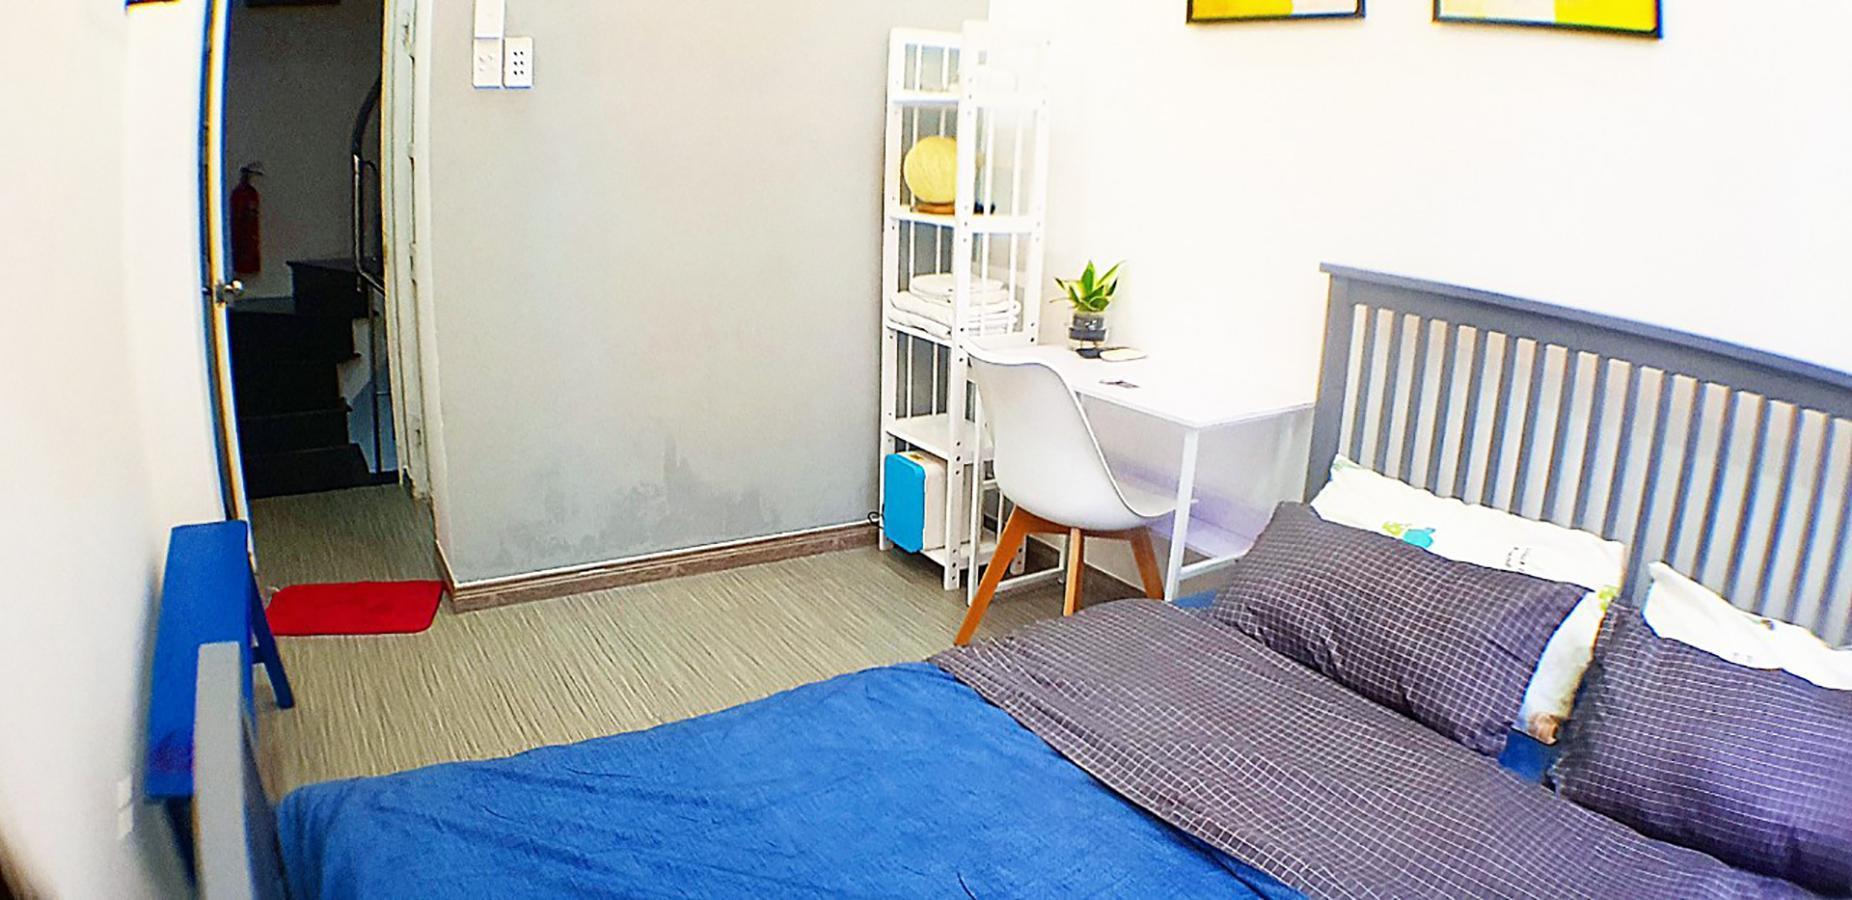 Travel Home's Fancy Private Room In Backbacker